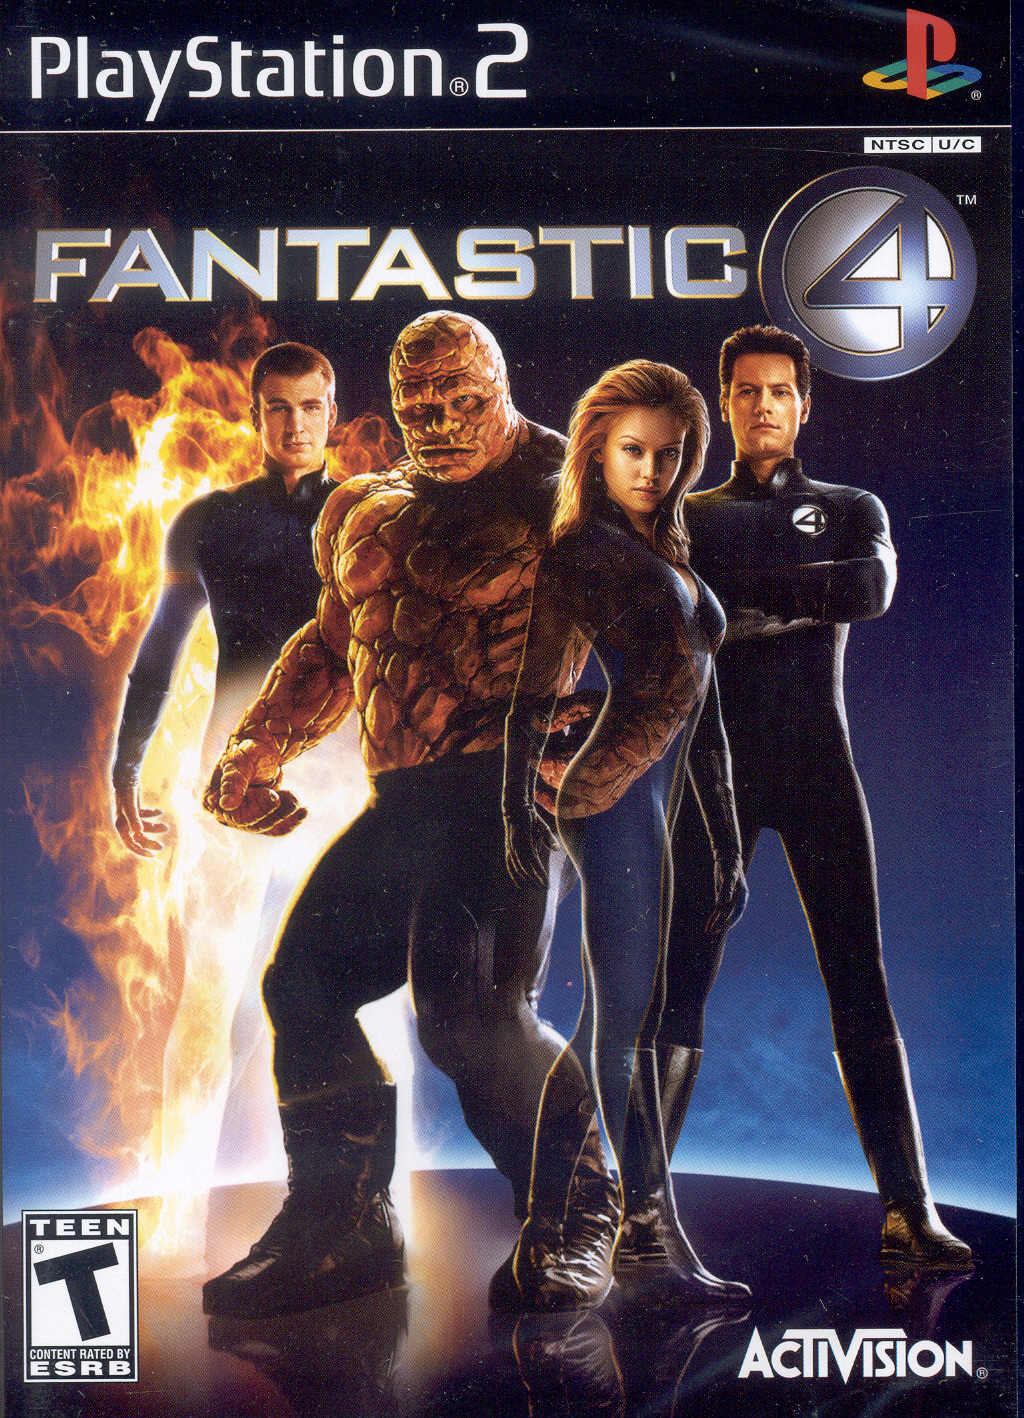 fantastic four 2005 streamcloud